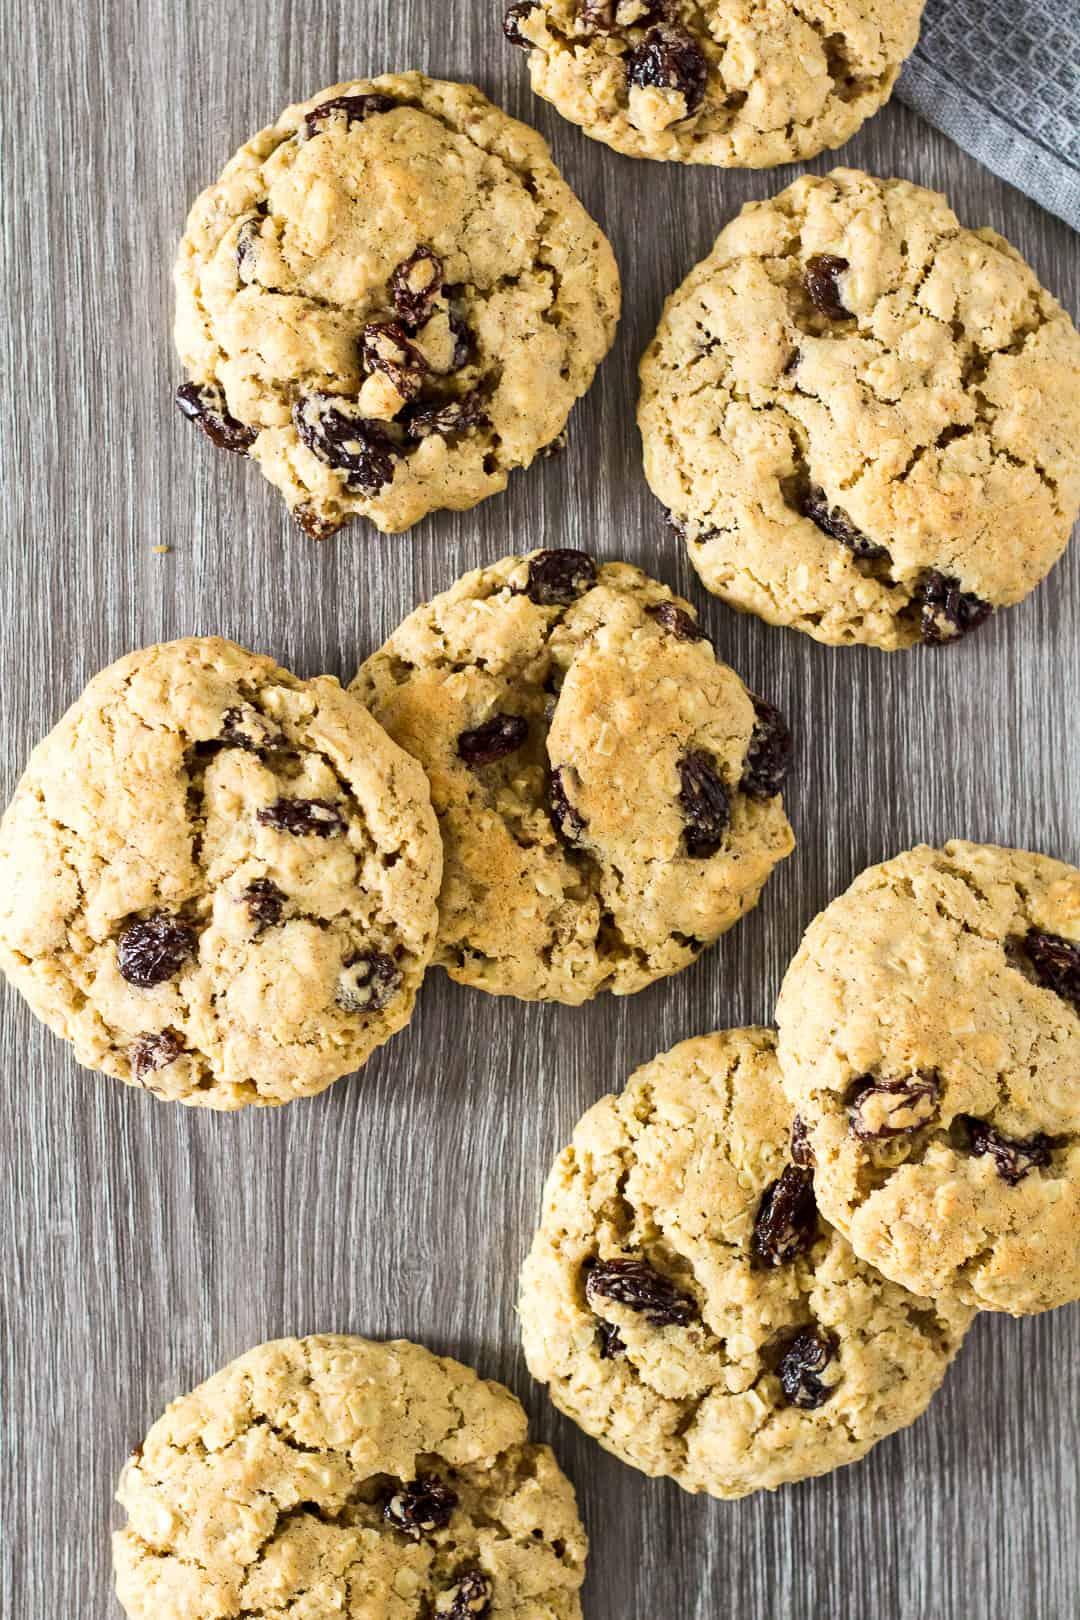 An overhead view of Oatmeal Raisin Cookies.